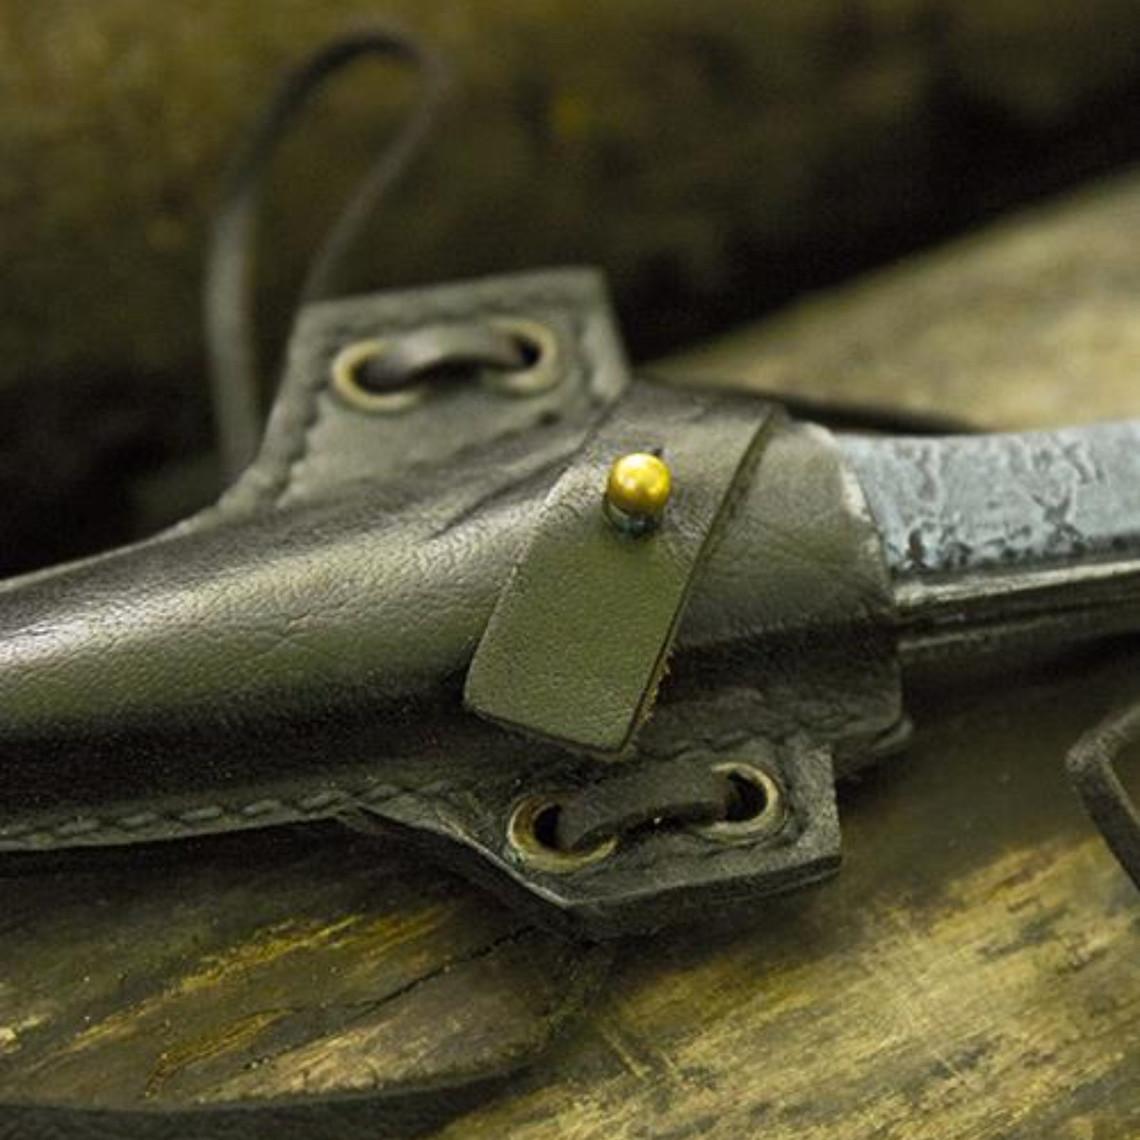 Epic Armoury GN couteau coupe-gorge avec support, noir